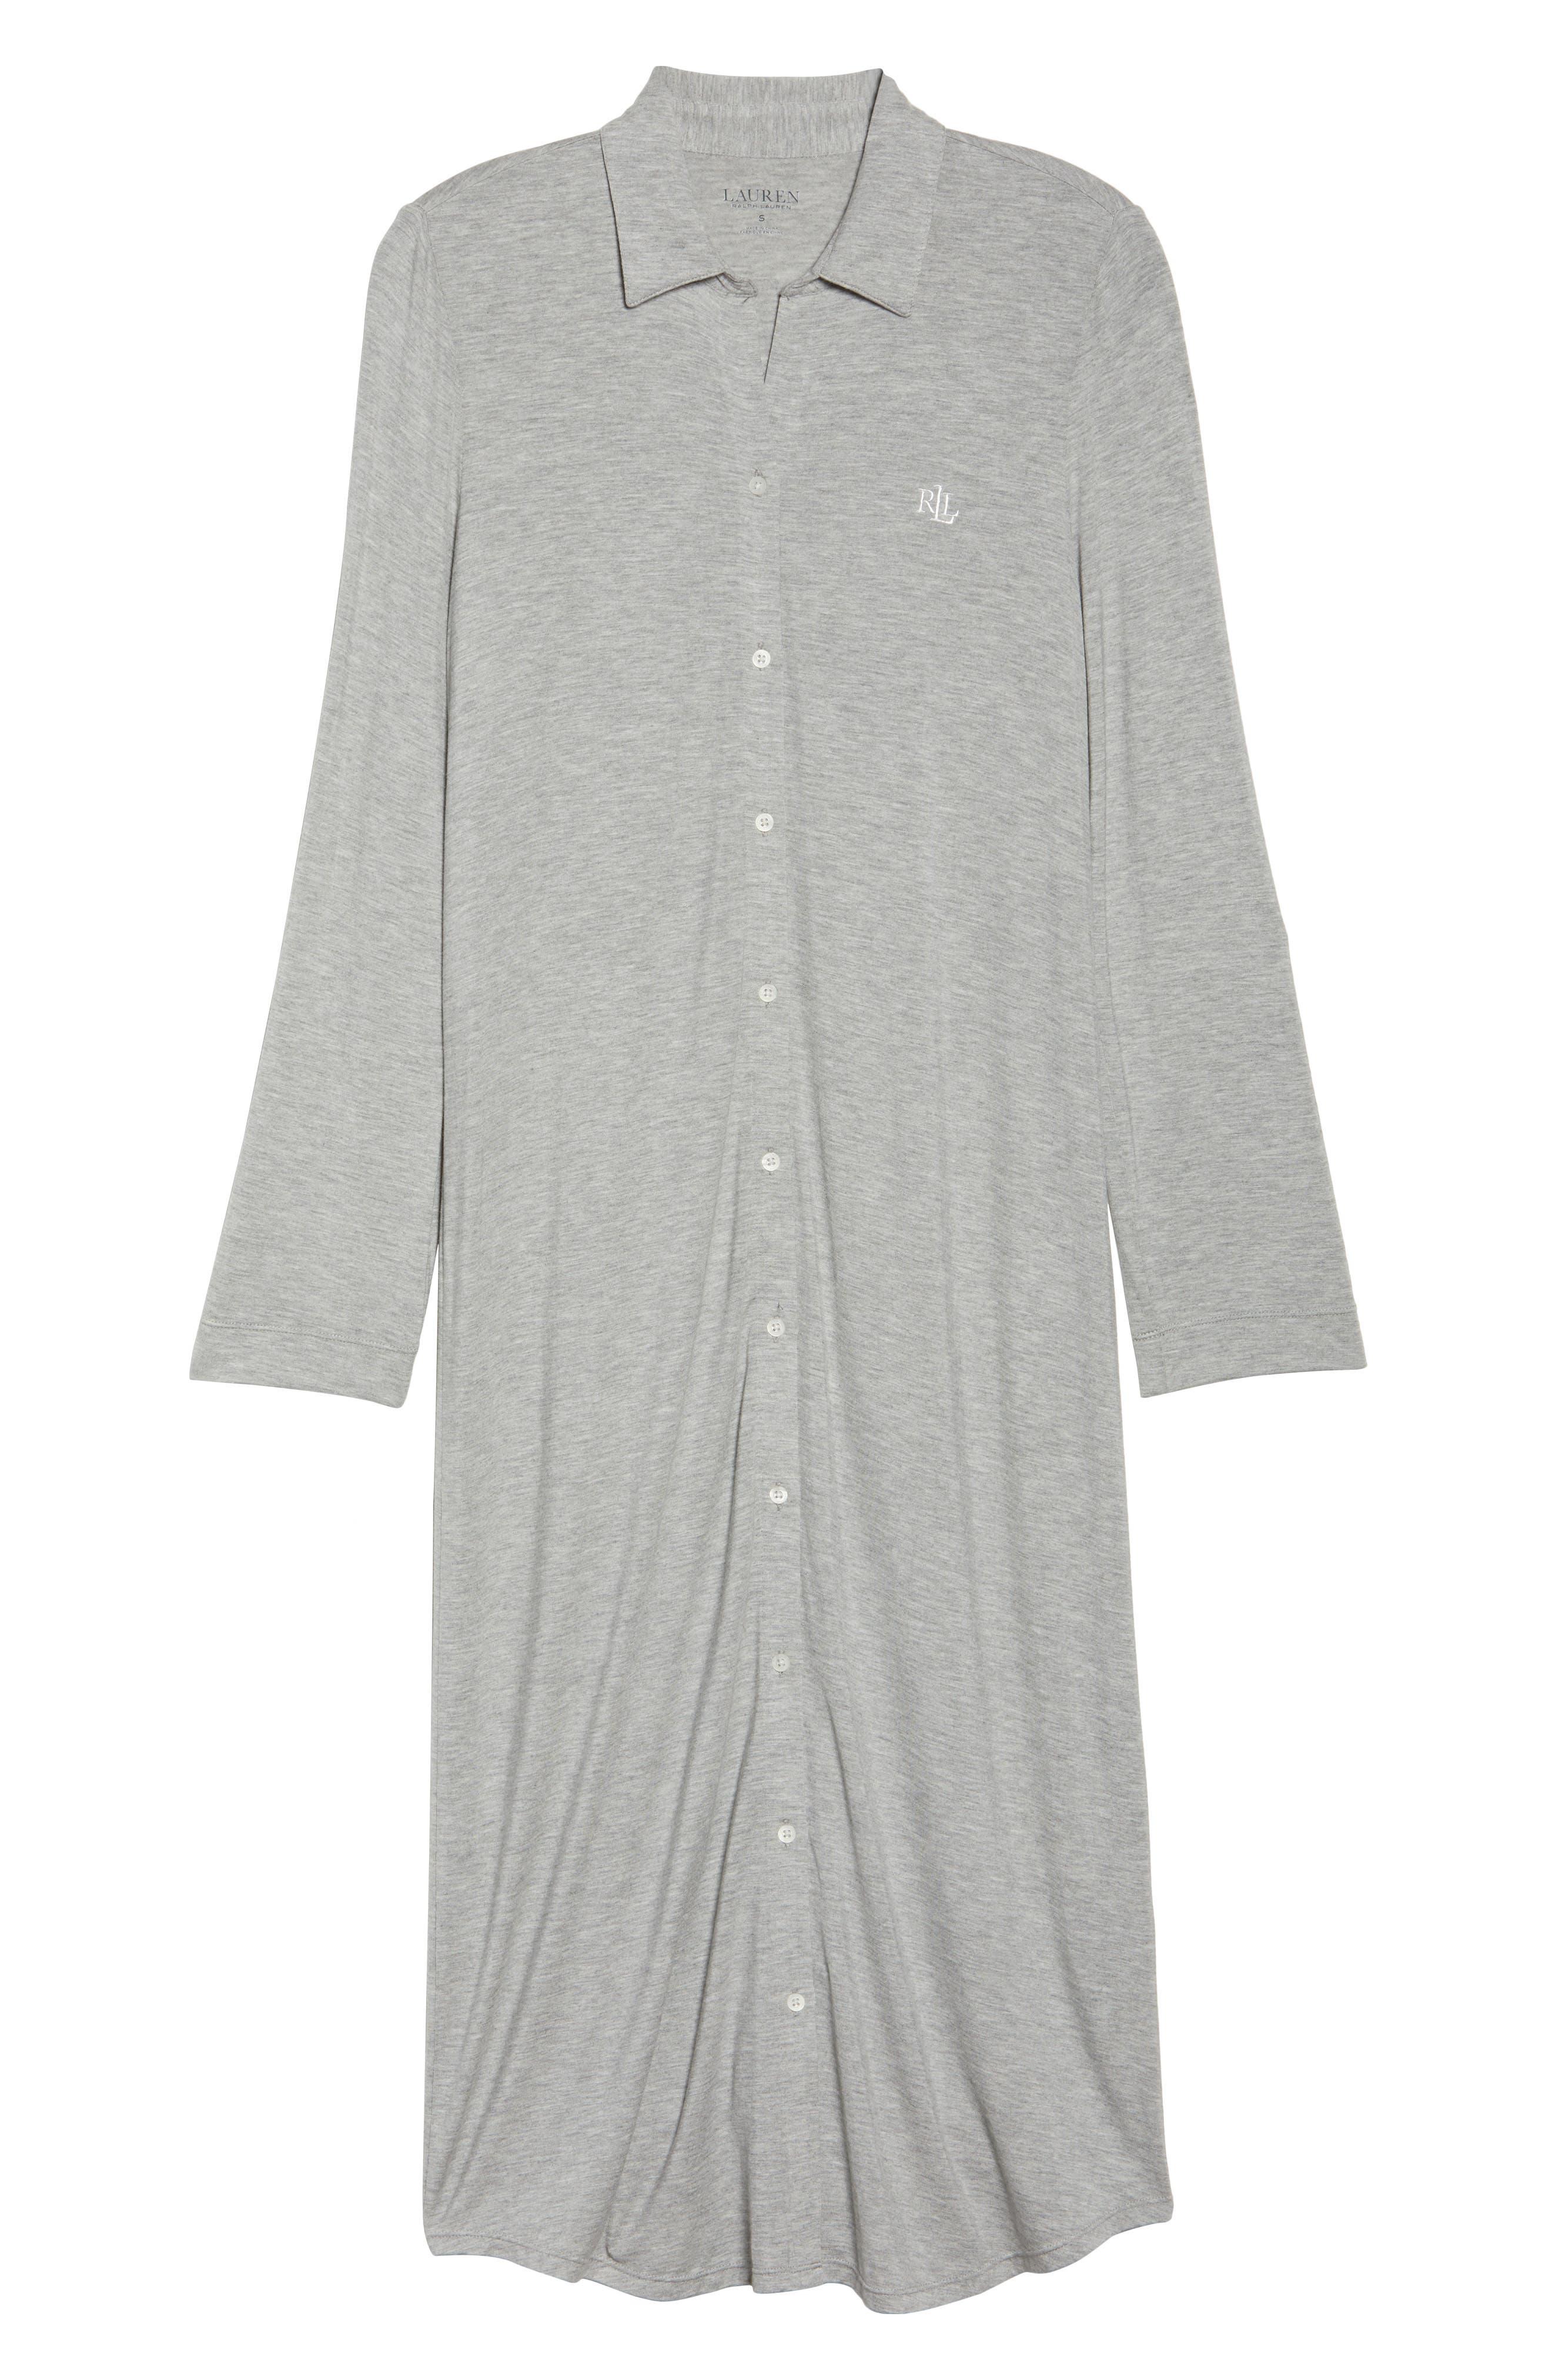 LAUREN RALPH LAUREN, Ballet Jersey Sleep Shirt, Alternate thumbnail 6, color, HEATHER GREY FEEDER STRIPE